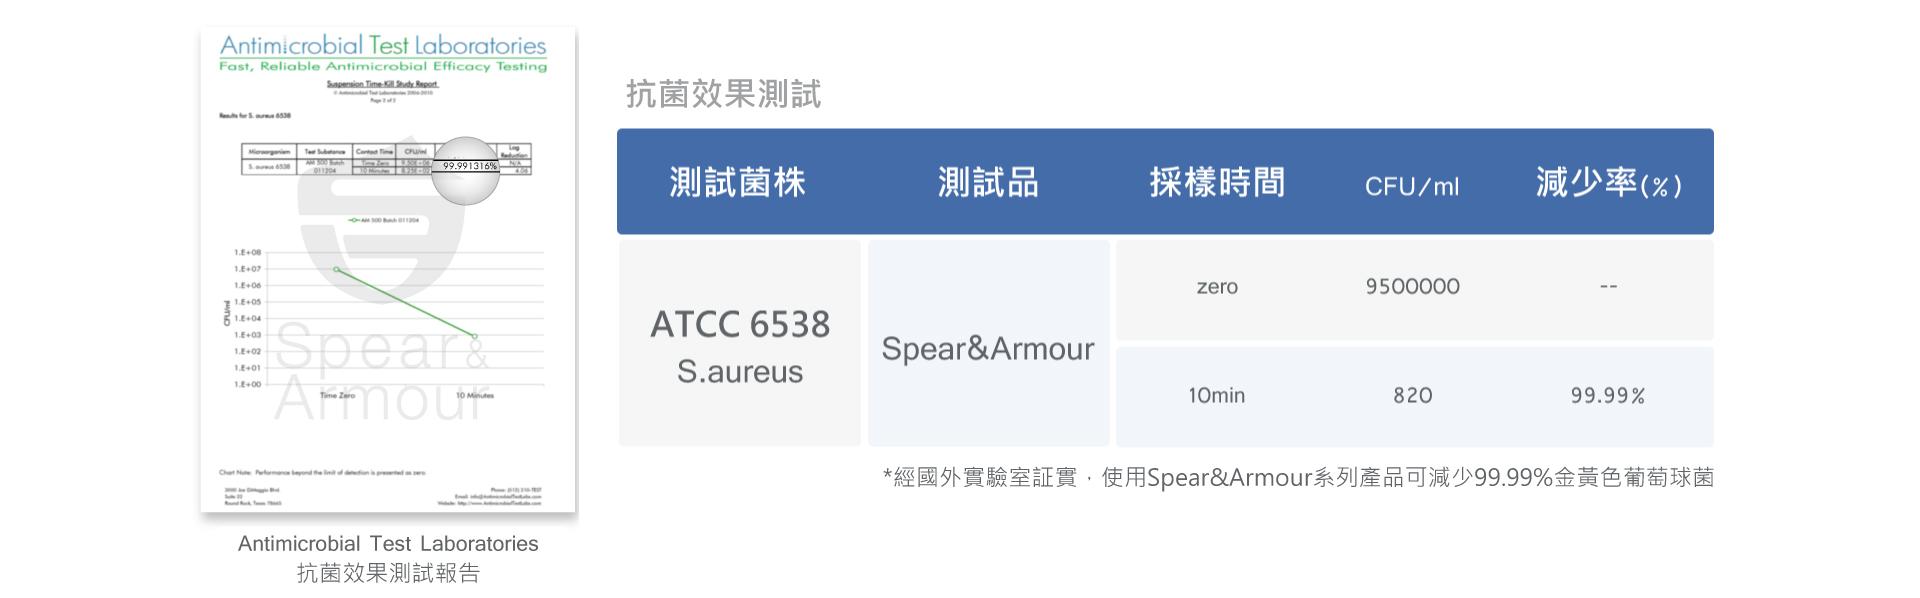 Spear & Armour 思必兒系列產品可有效減少99.99%金黃色葡萄球菌(S.aureus)